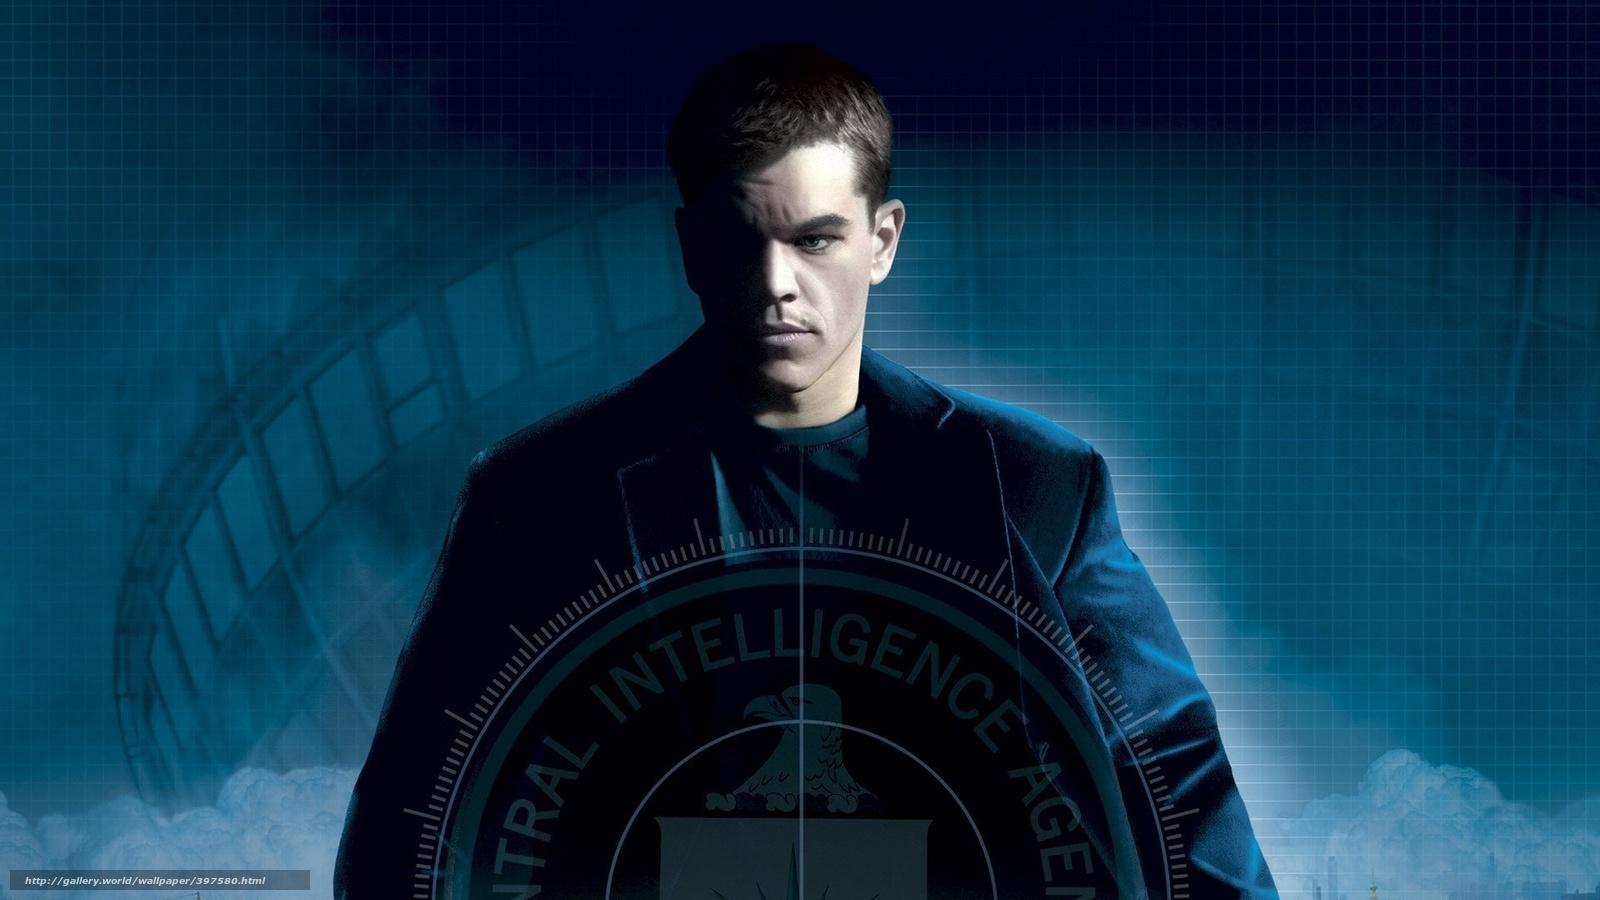 Download wallpaper bourne supremacy,  film,  The Bourne Supremacy,  BORN free desktop wallpaper in the resolution 1920x1080 — picture №397580